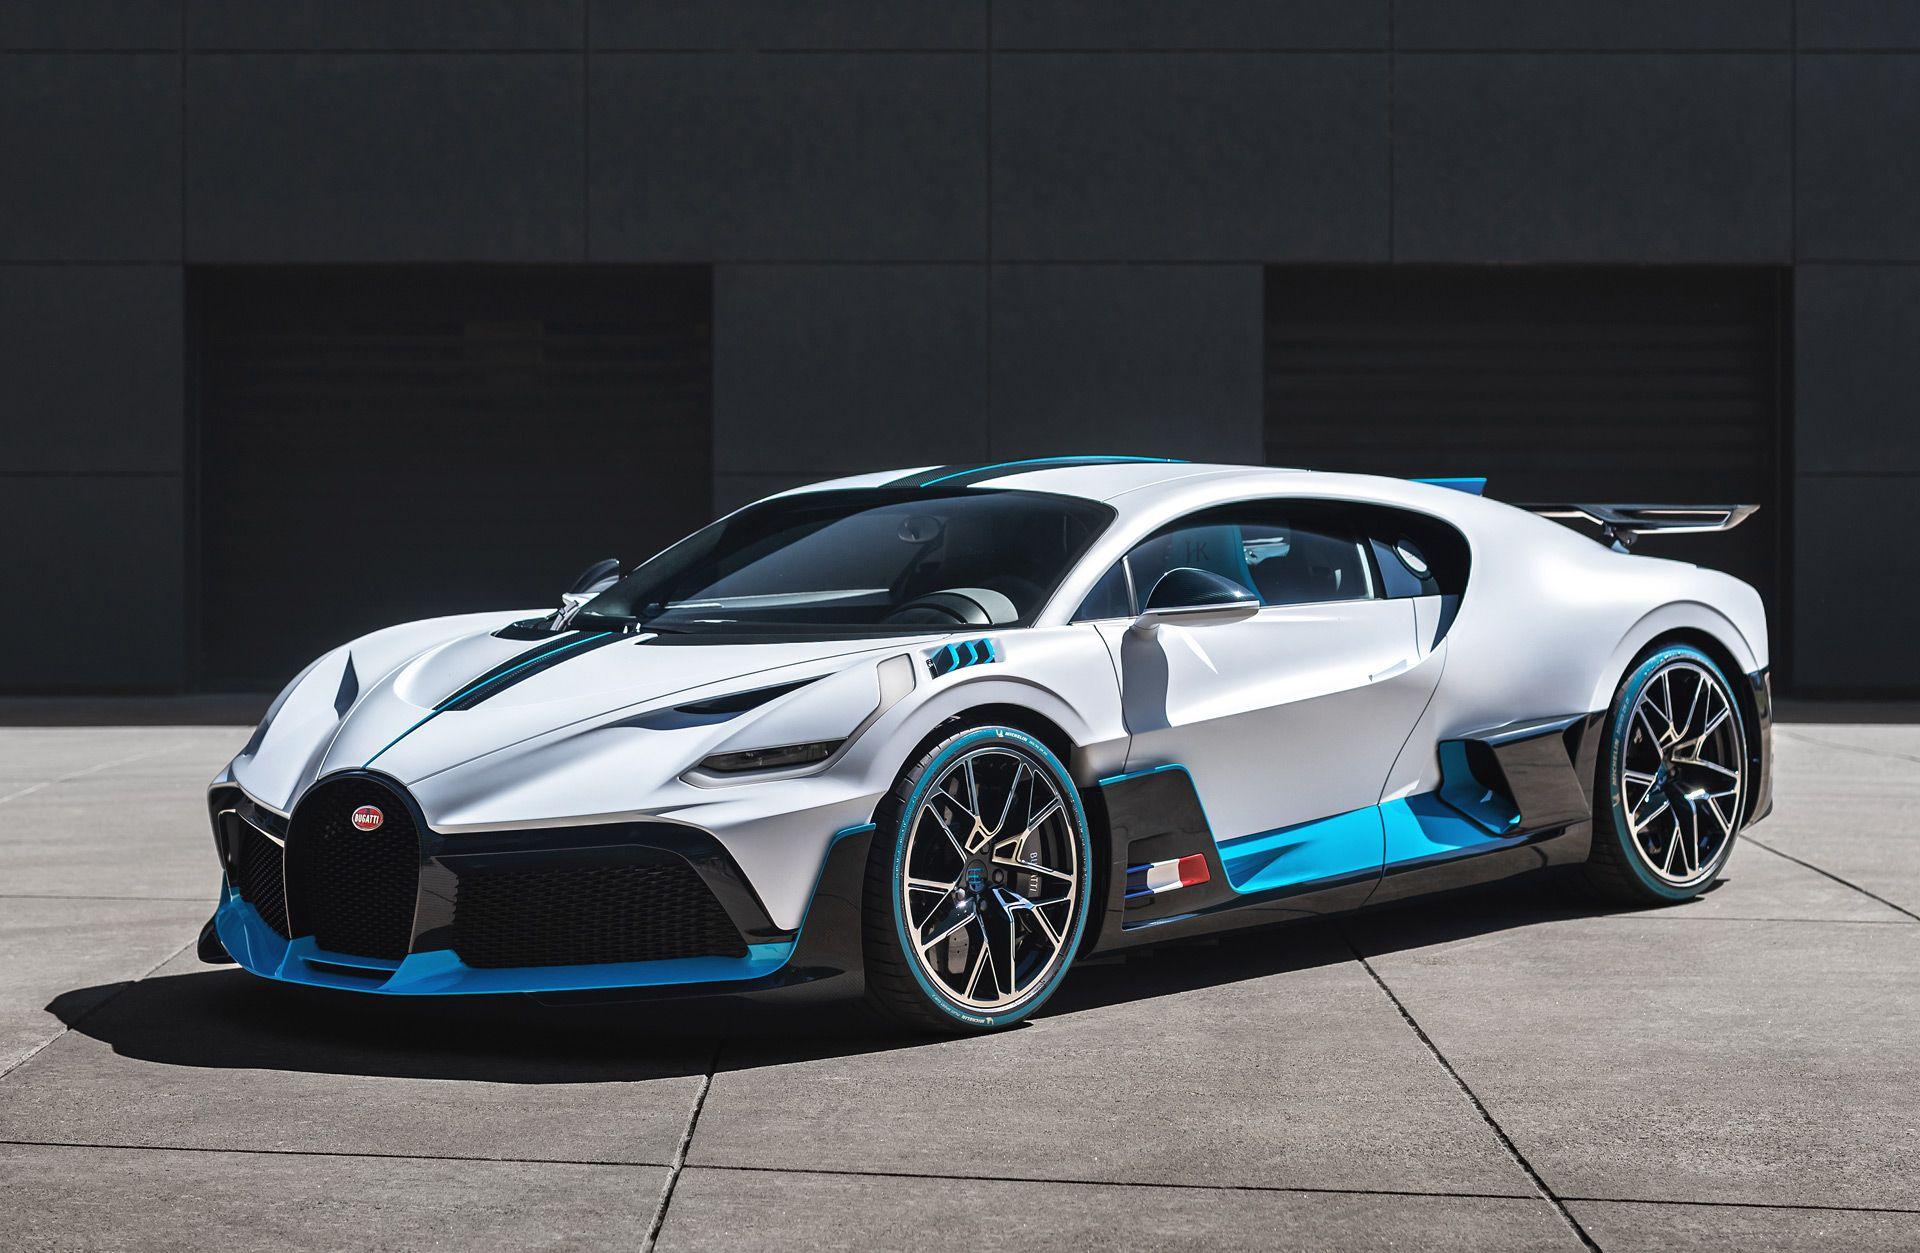 Https Www Motorauthority Com News 1127927 Bugatti Delivers First Divos To Customers In 2020 Super Car Bugatti Super Luxury Cars Bugatti Cars